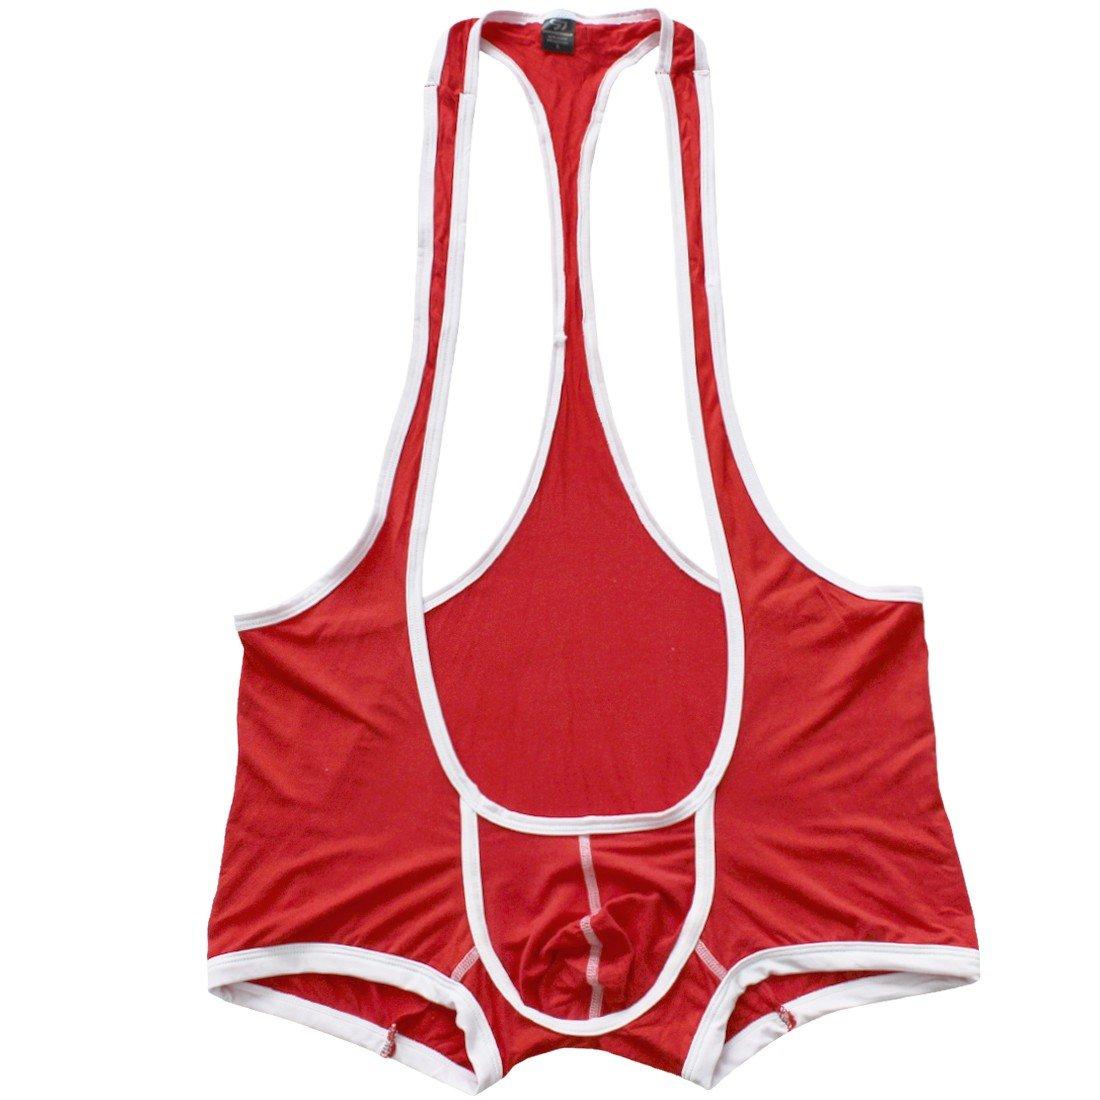 TiaoBug Men's Boxers Underwear Jockstrap Wrestling Singlet Leotard Bodysuit Stretch Bodywear